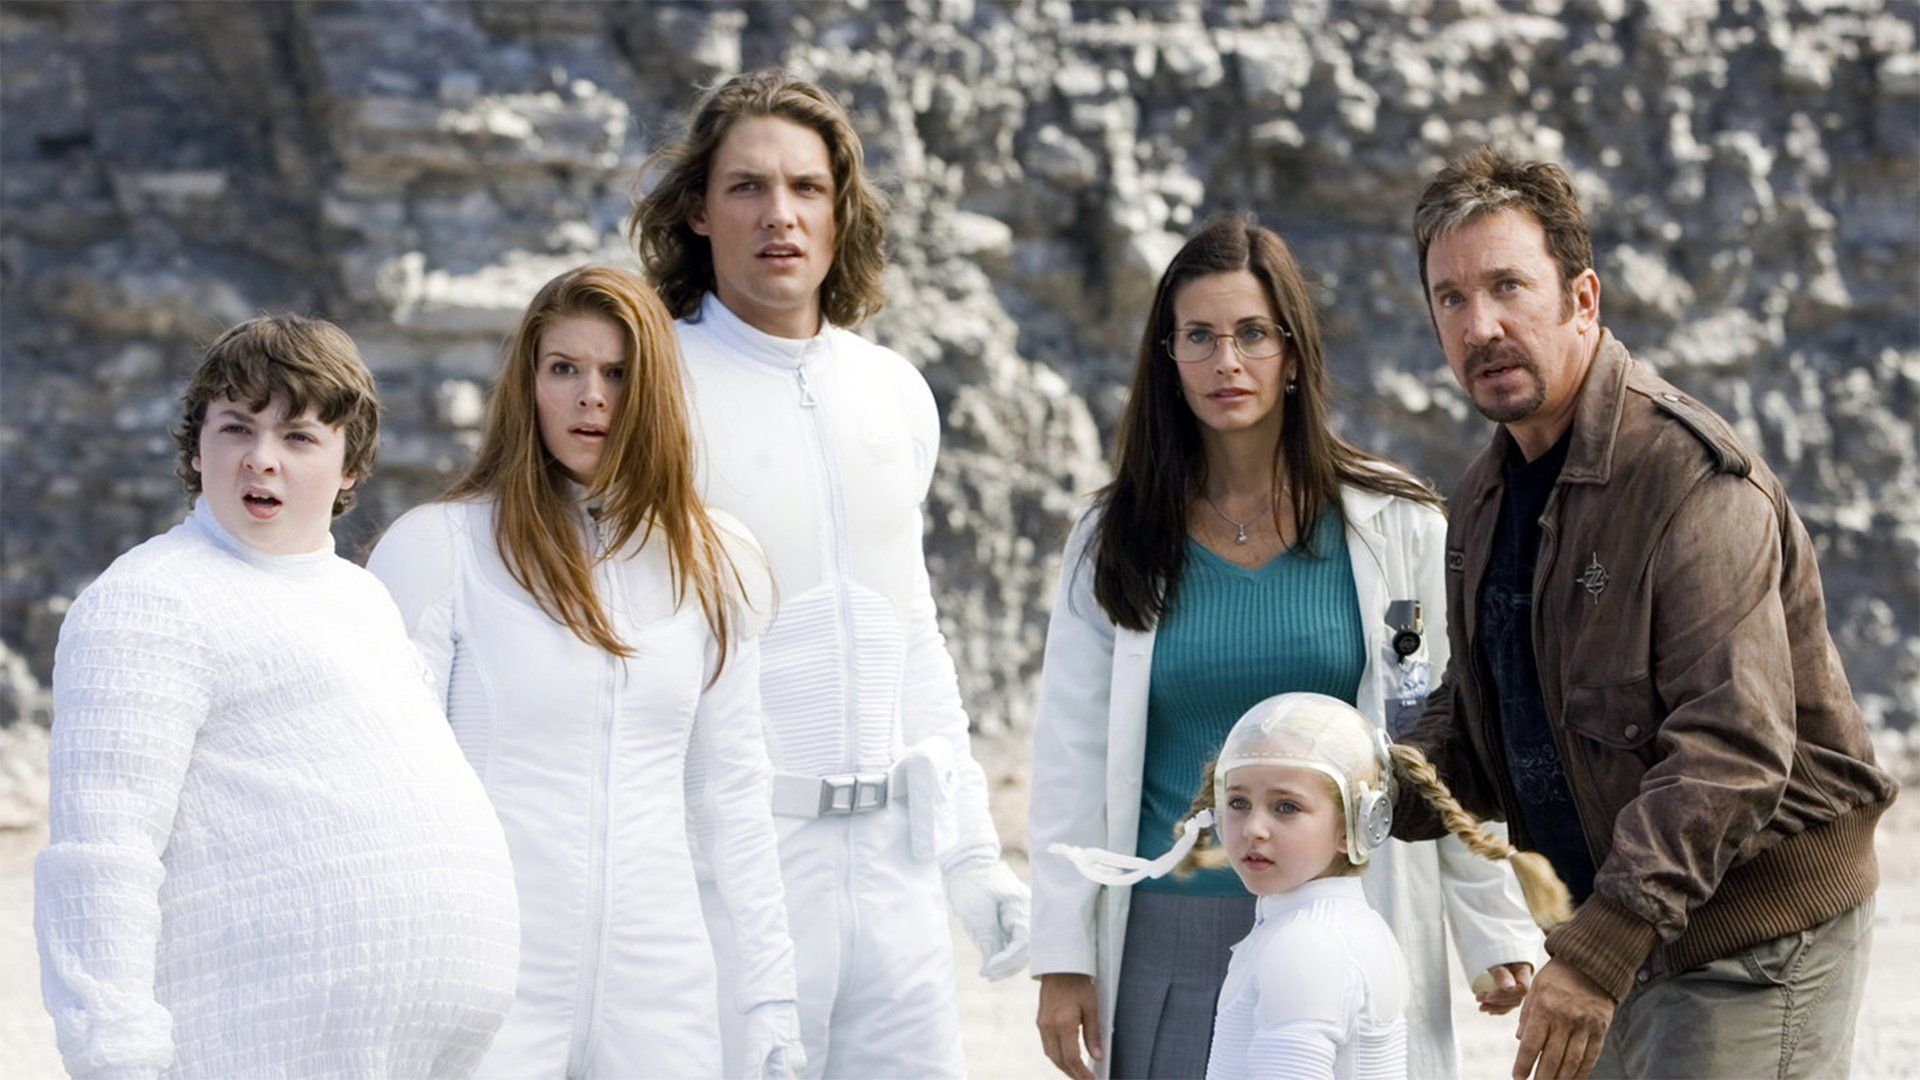 Tim Allen, Courteney Cox, Spencer Breslin, Rooney Mara, Michael Cassidy, Ryan Newman in Zoom Academy for Superheroes (2006)